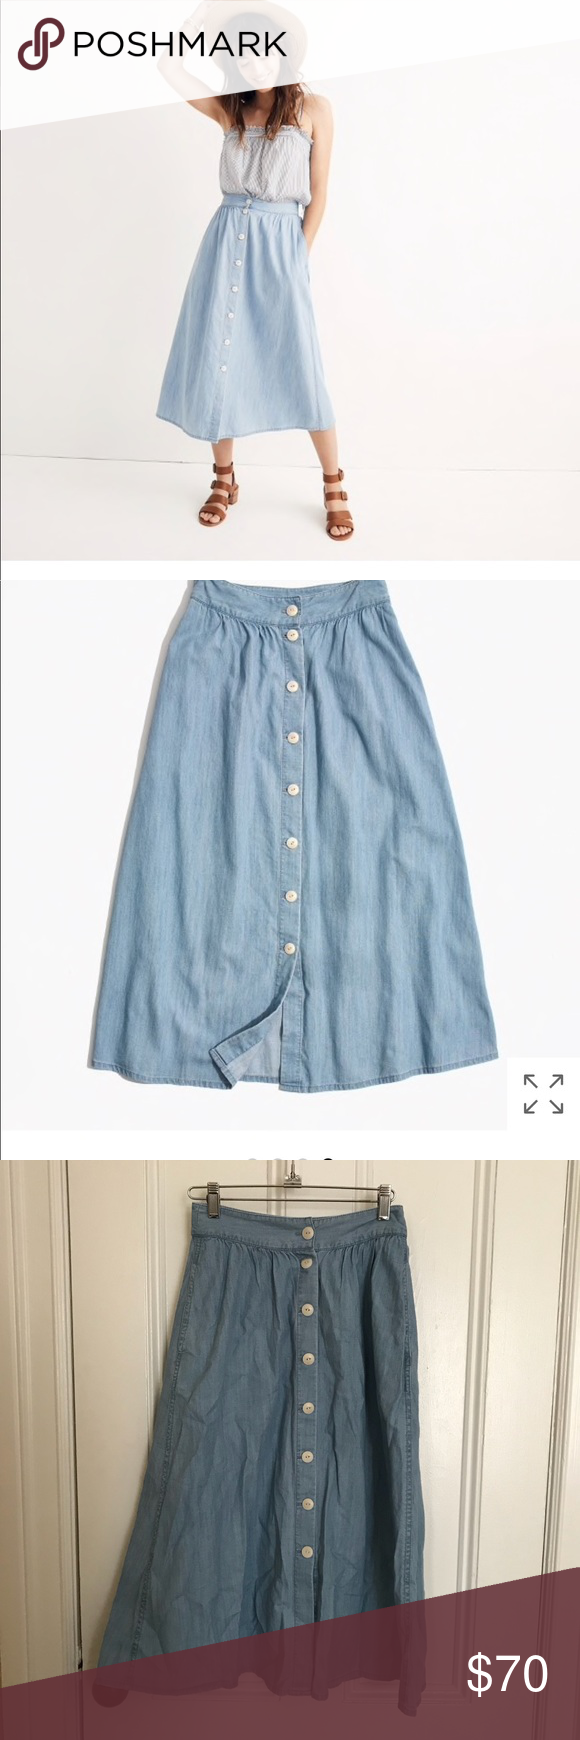 eff566d5b6 Madewell Button front midi Skirt Madewell Palisade Button Front Midi Skirt  in Indigo Size 00 Still